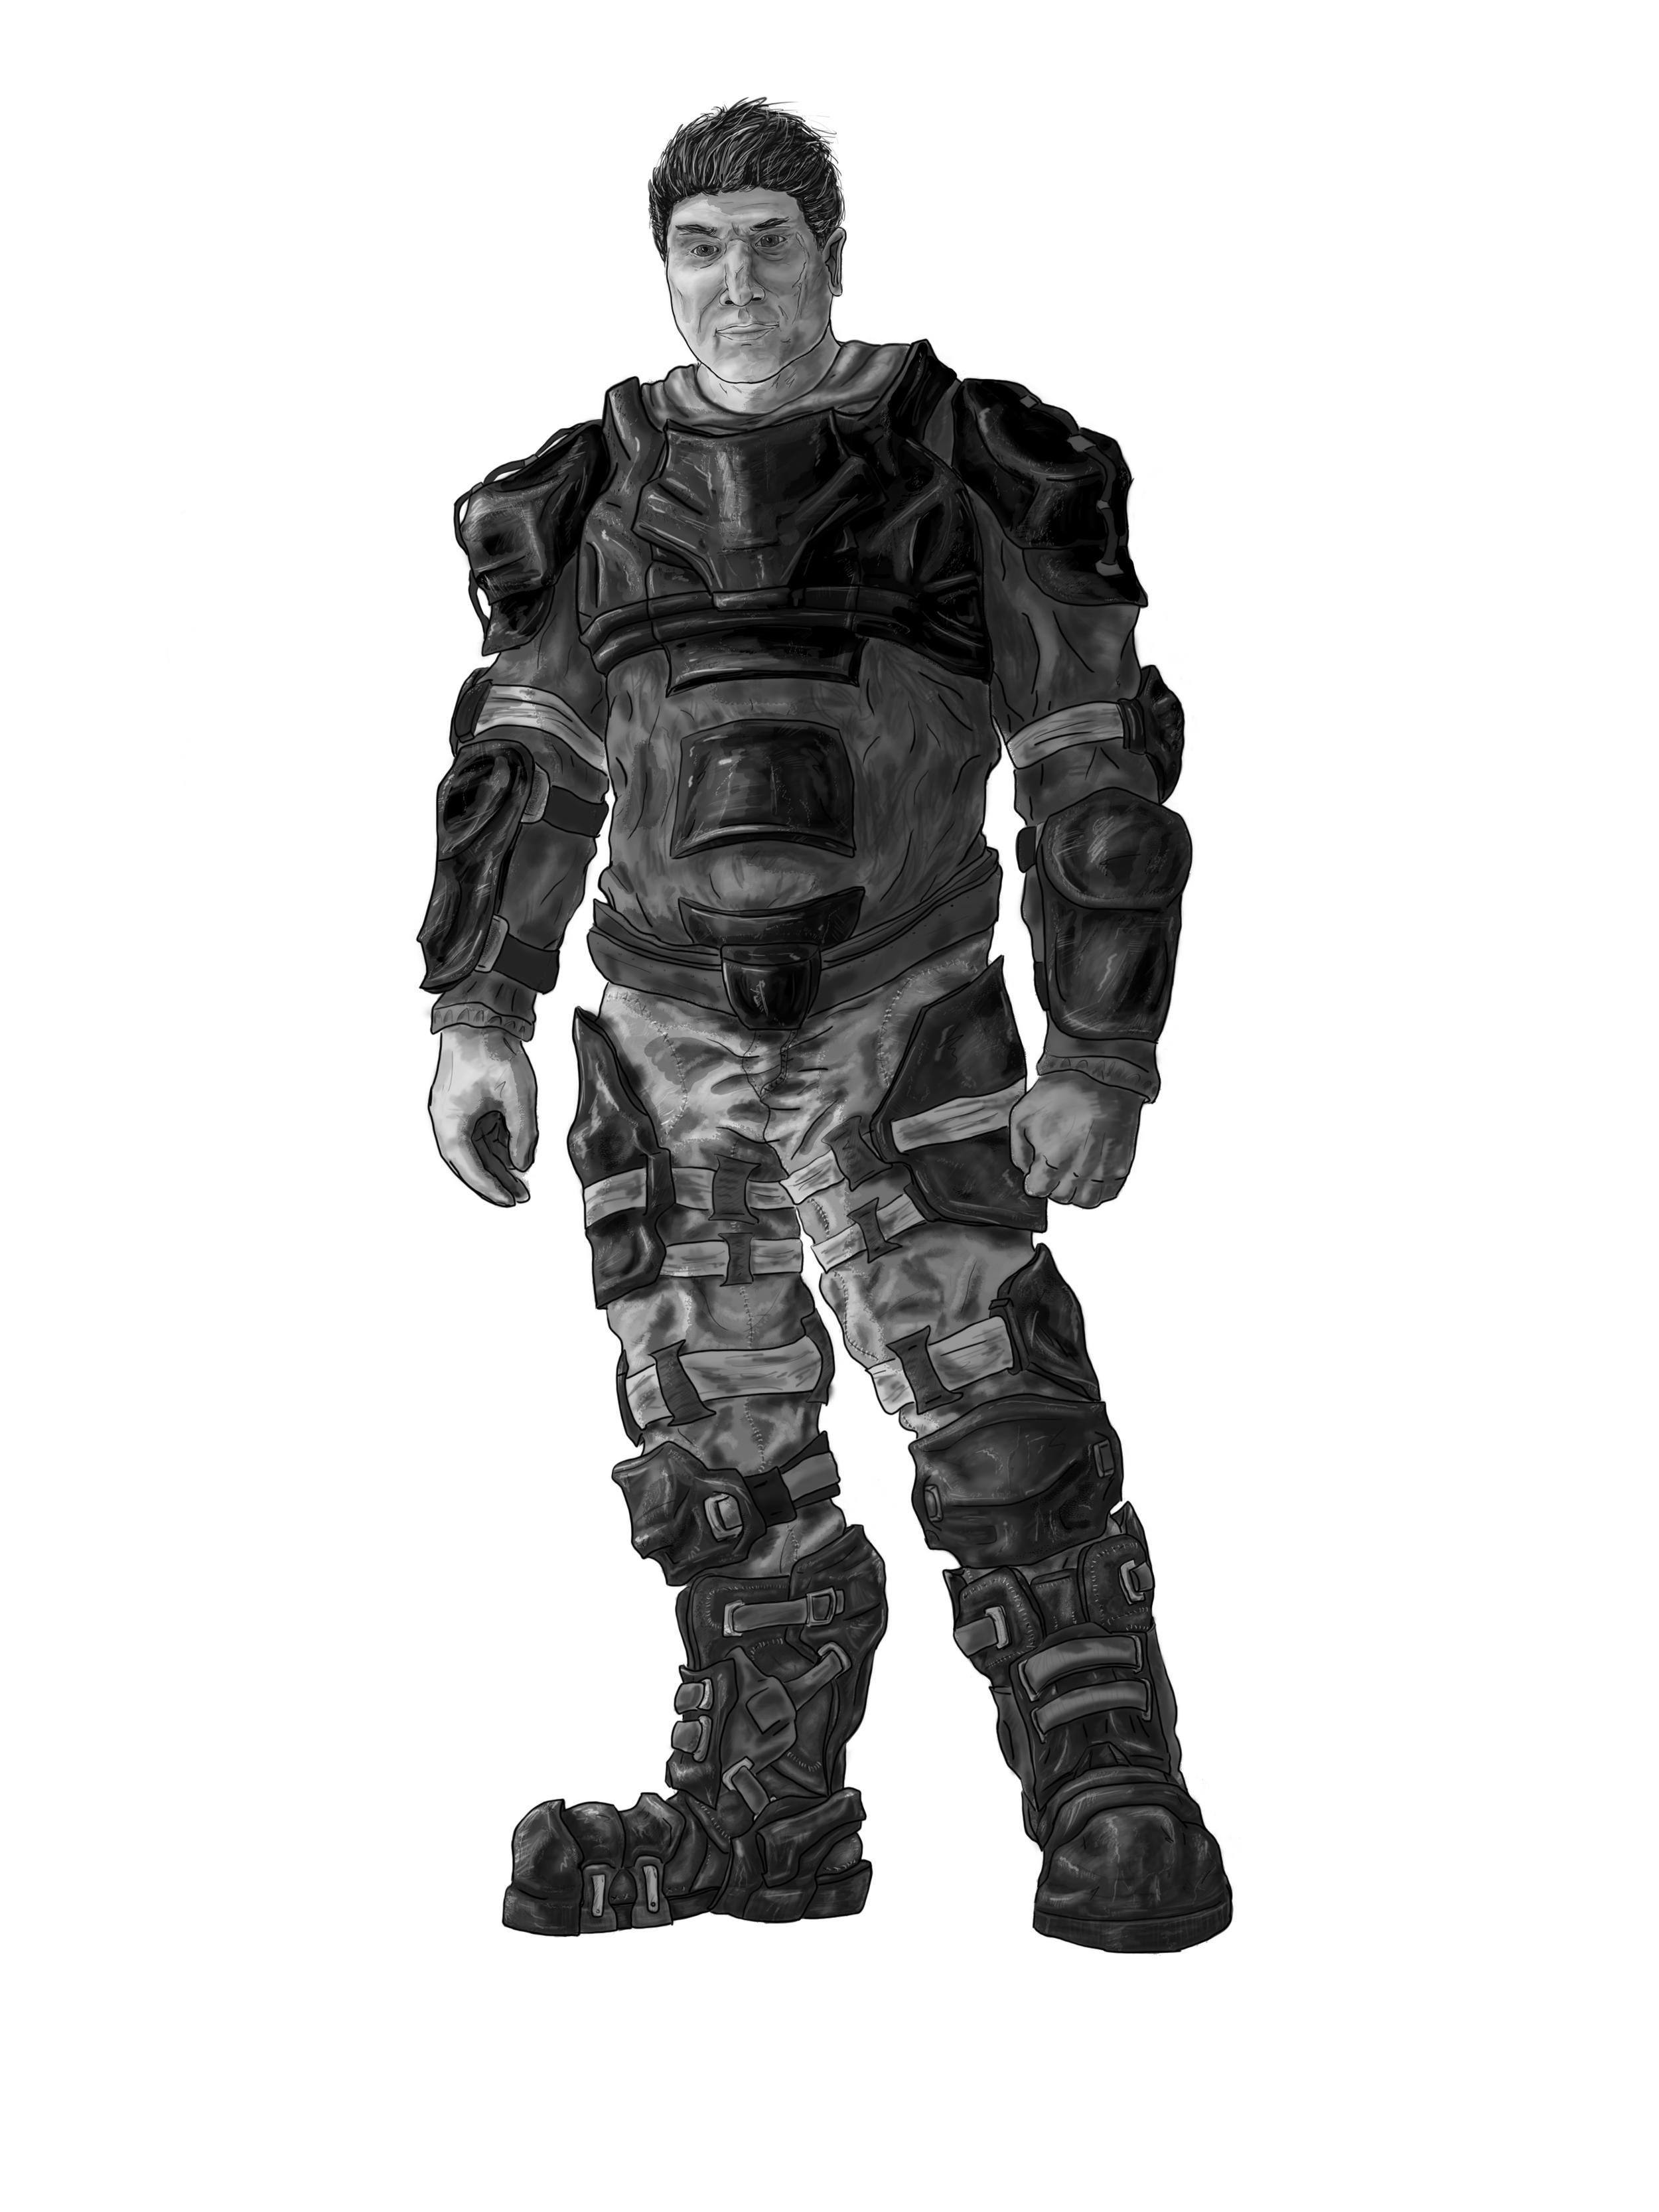 NPC Daryle Concept - Greyscale